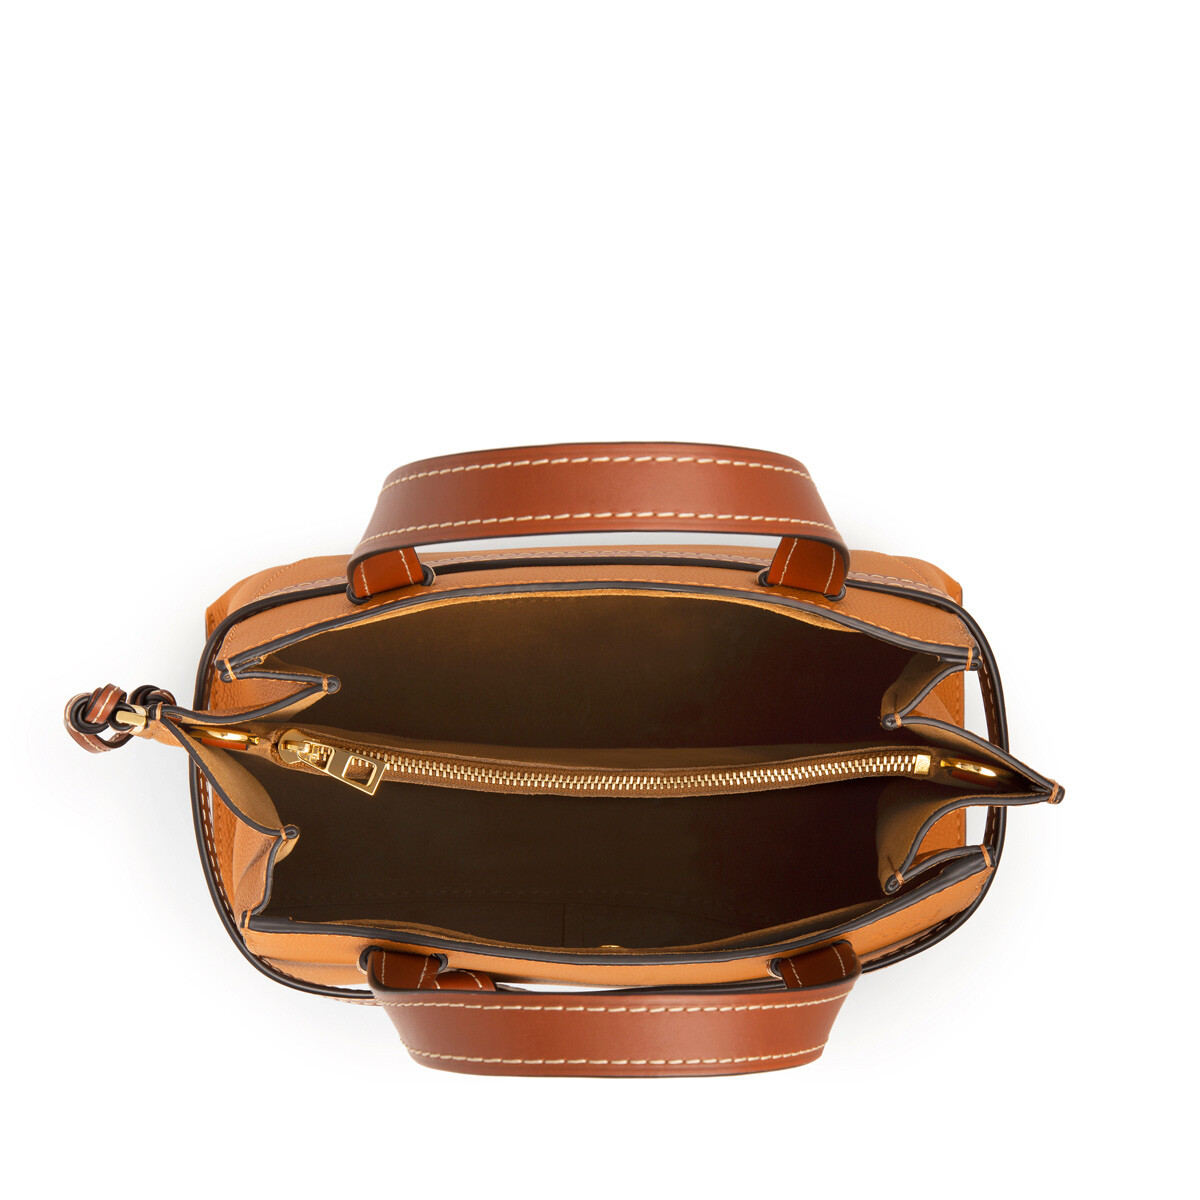 LOEWE Gate Top Handle Small Bag Light Caramel/Pecan front